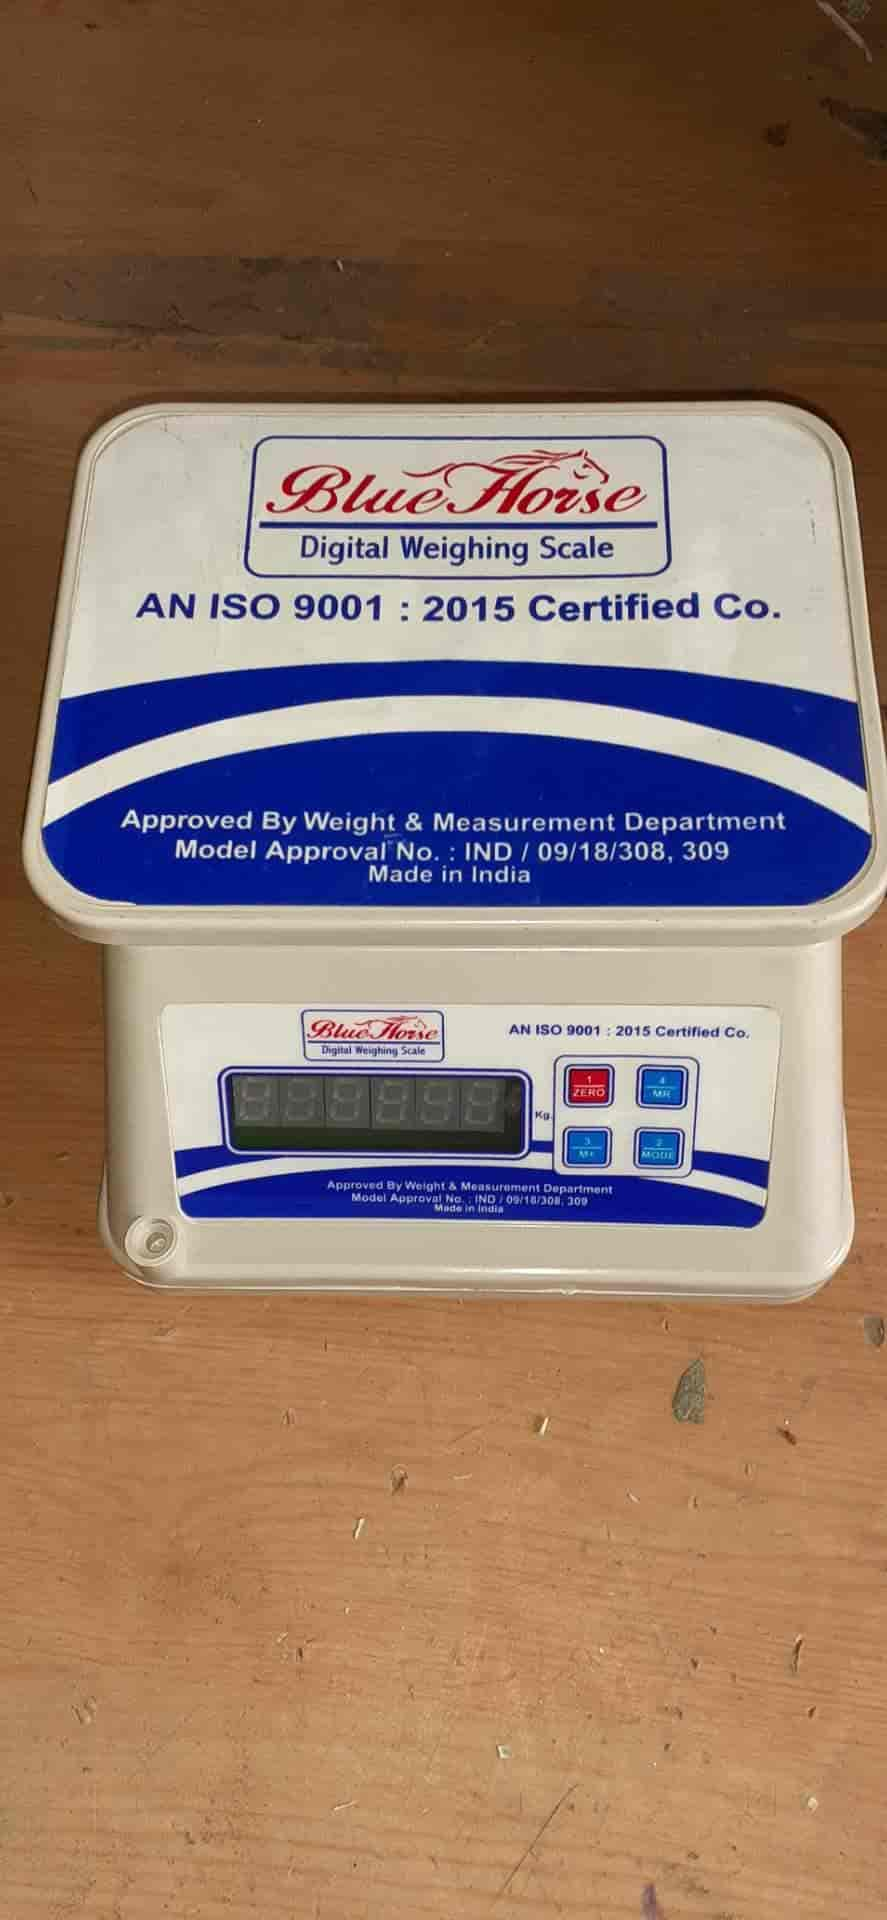 Shri Shyam Tula Weighing System, Shahdara - Weighing Machine